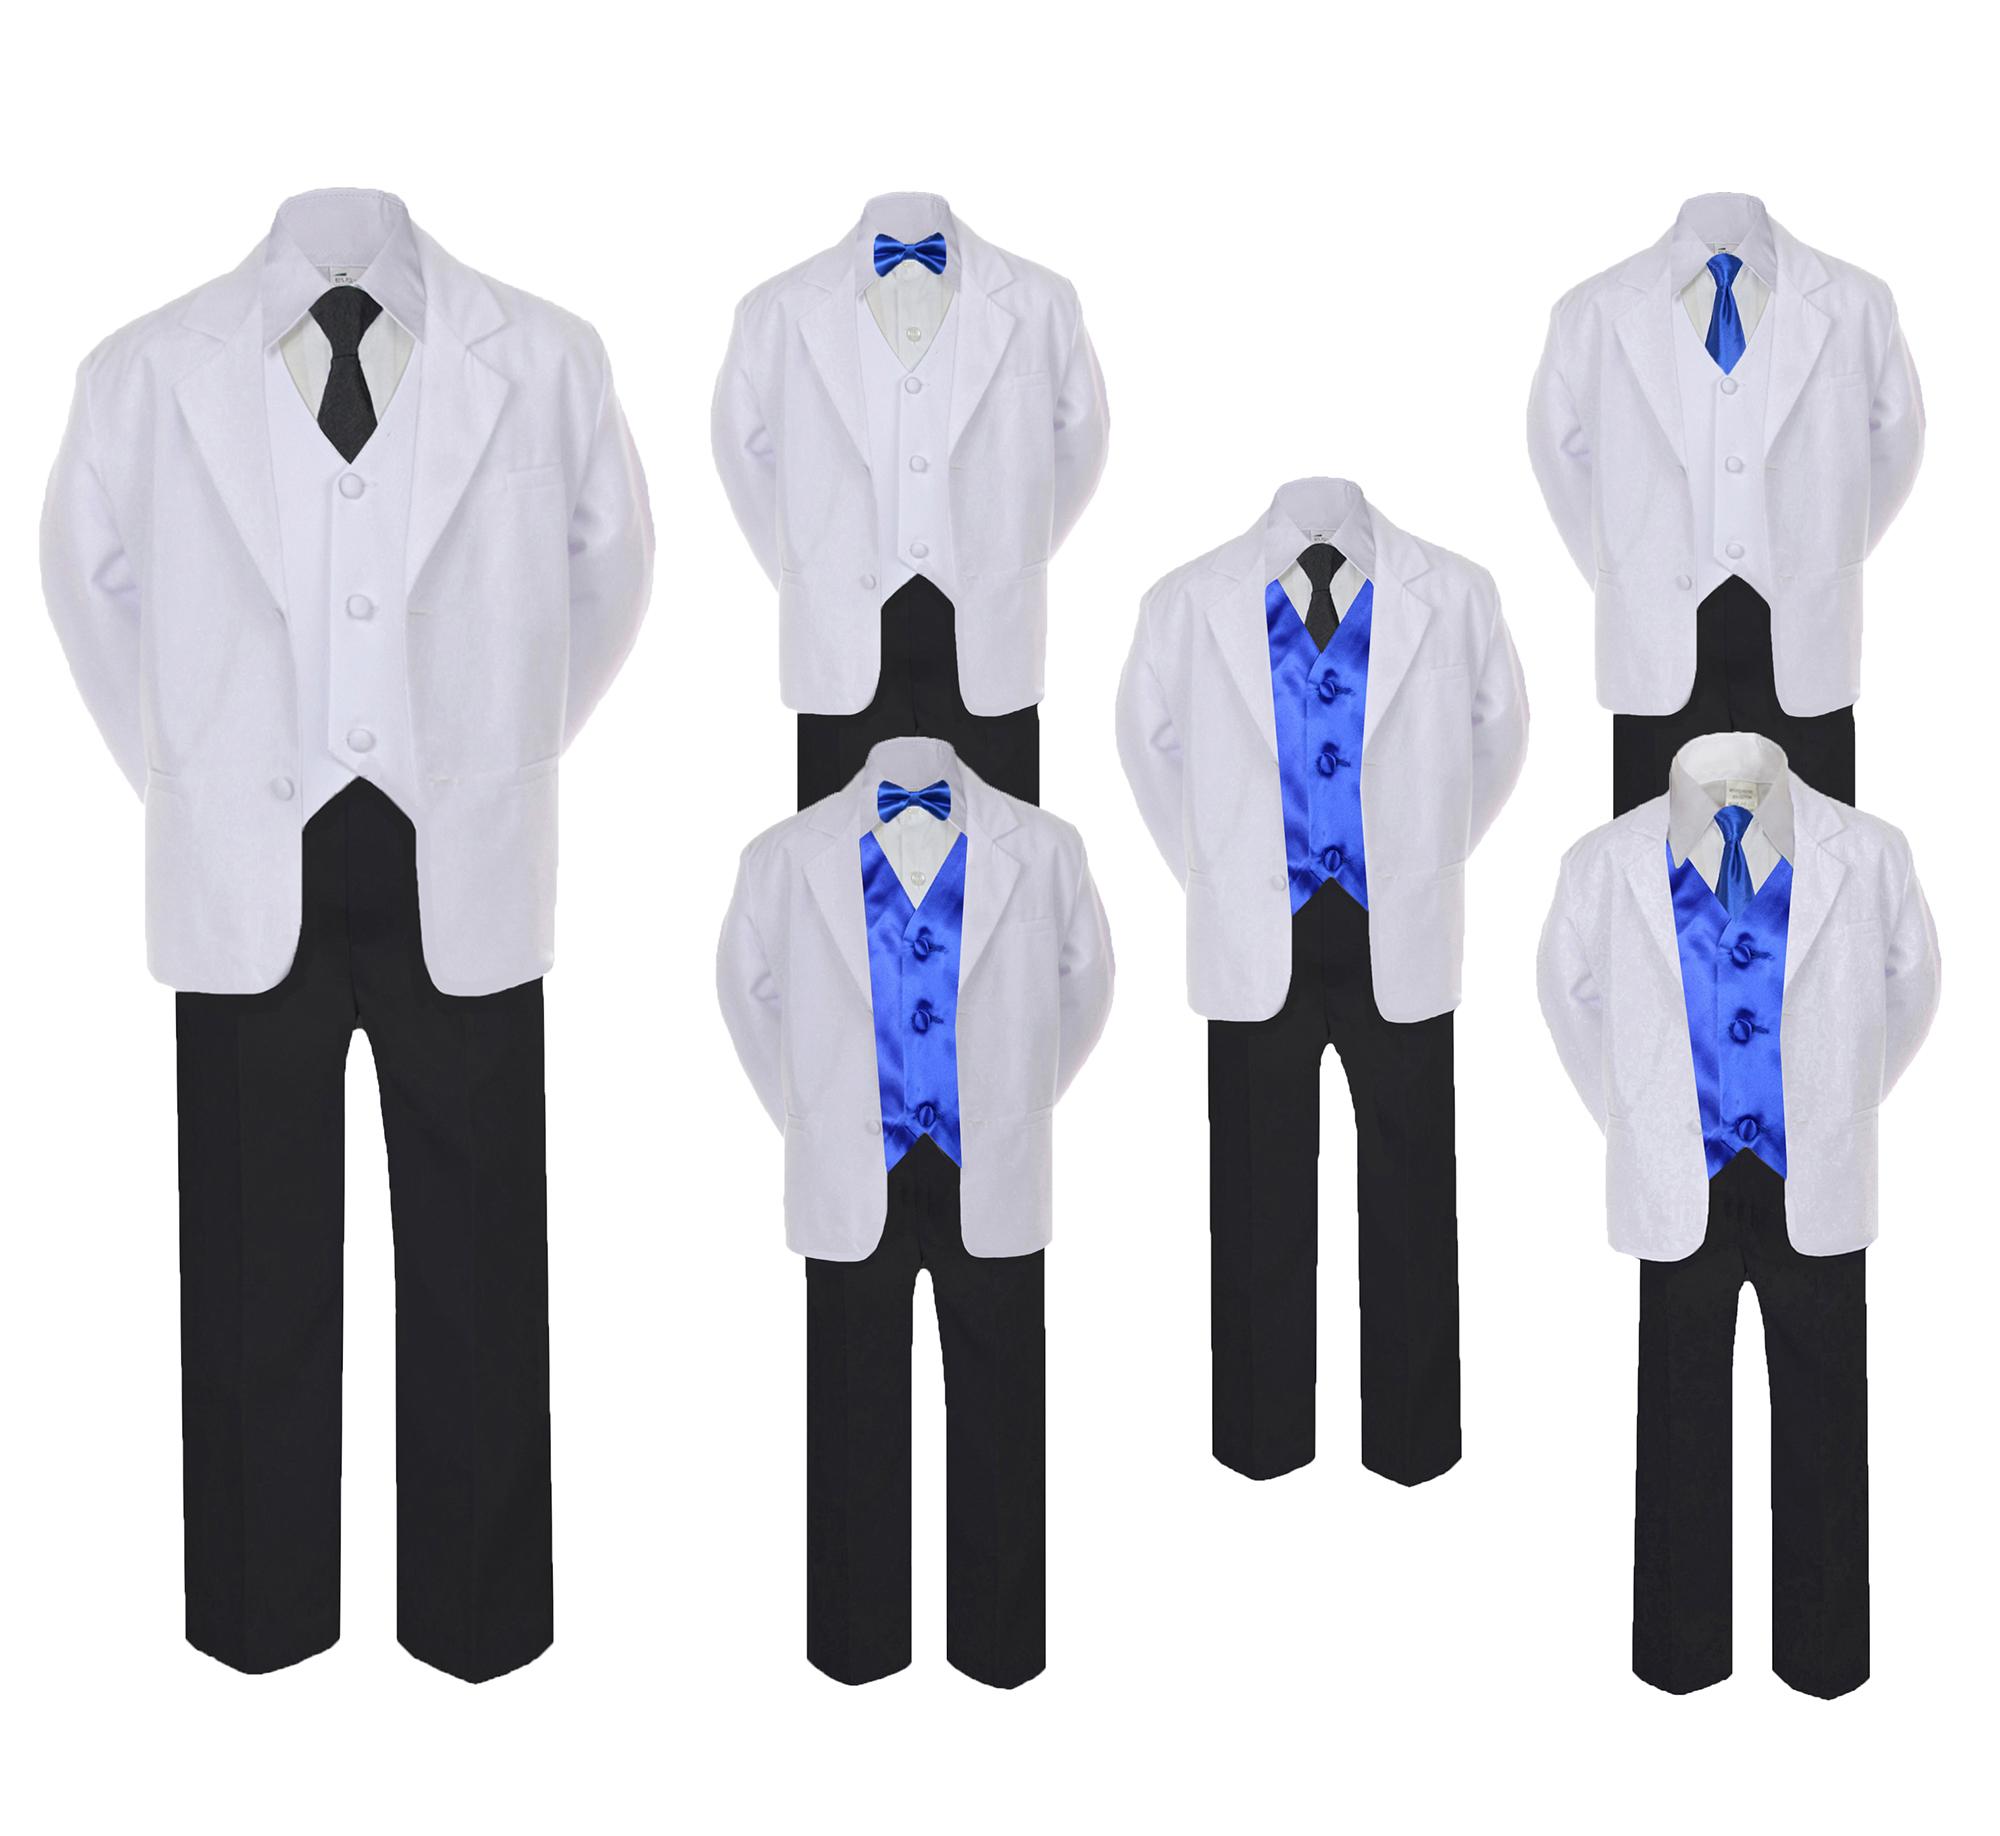 Leadertux Baby Toddler Boy Kid Wedding Party Suit Gray Shorts Shirt Hat Necktie Set Sm-4T